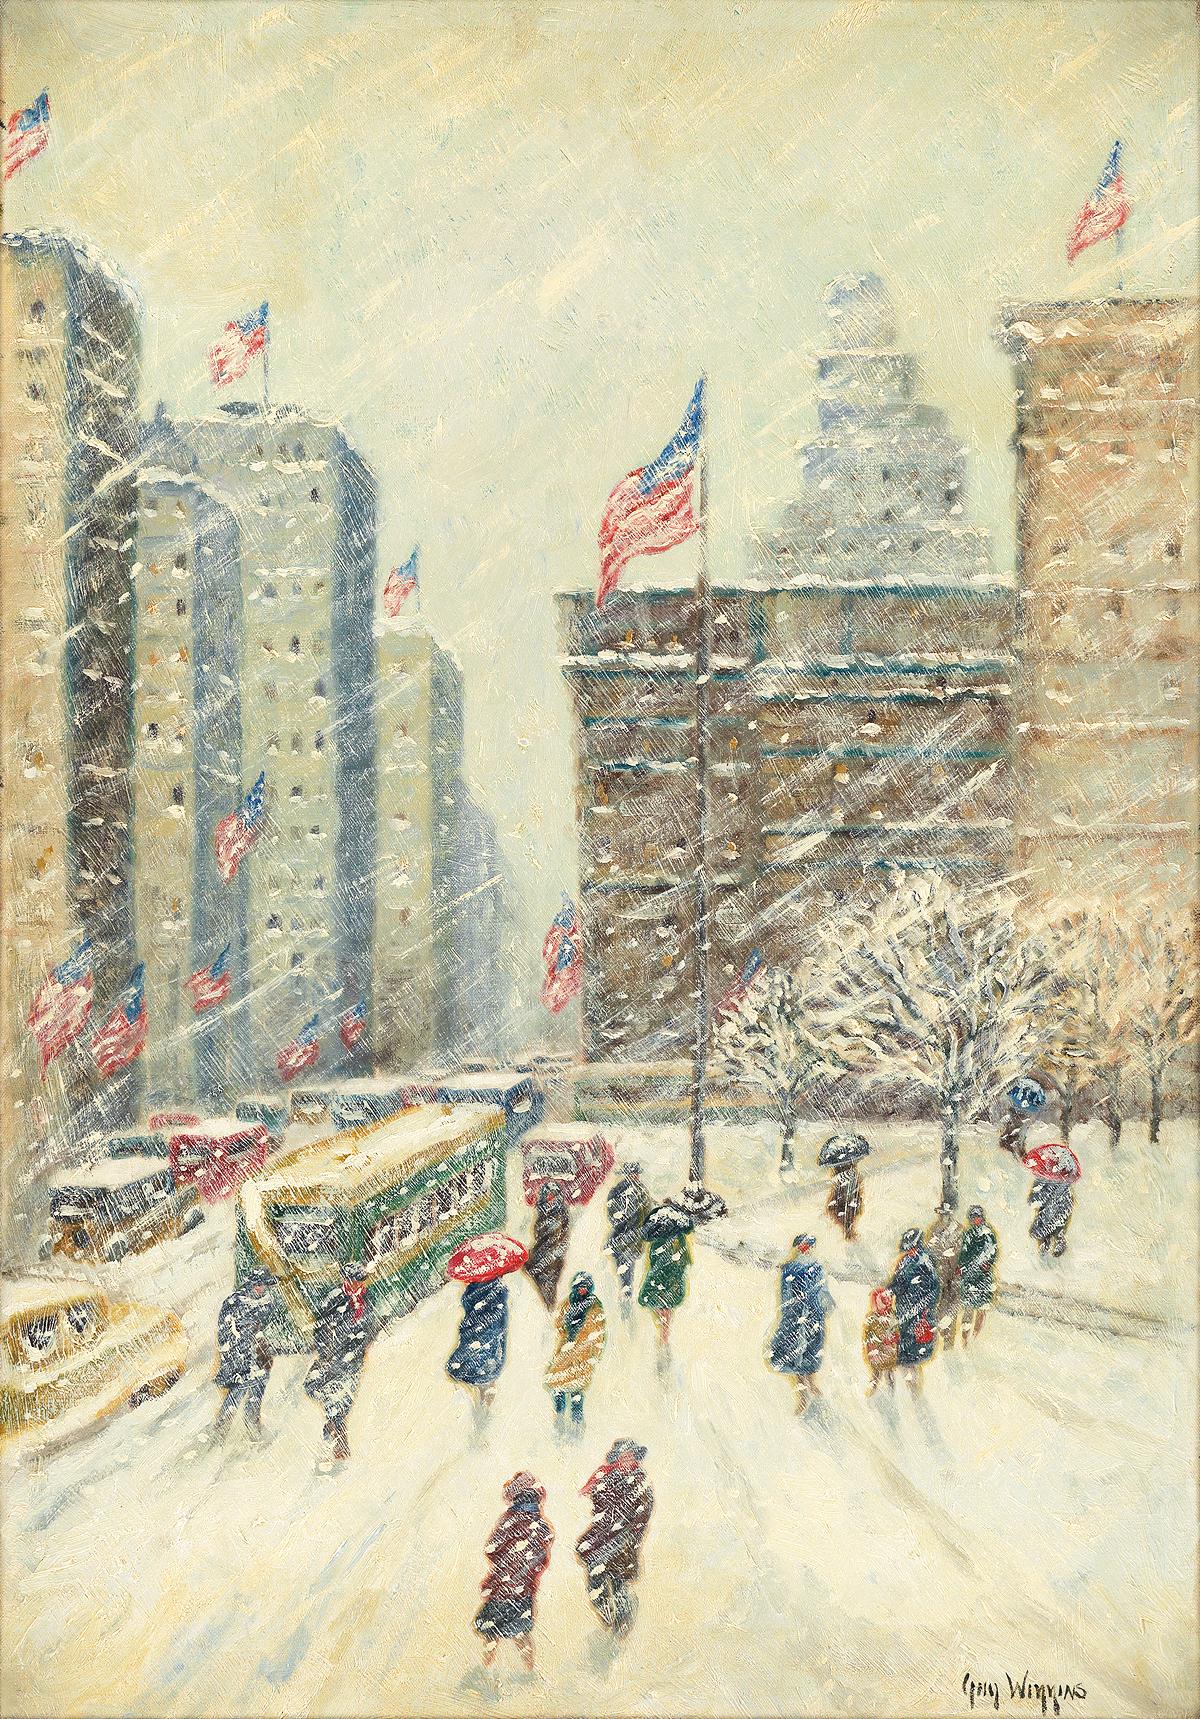 GUY-WIGGINS-Fifth-Avenue-New-York-in-Snow